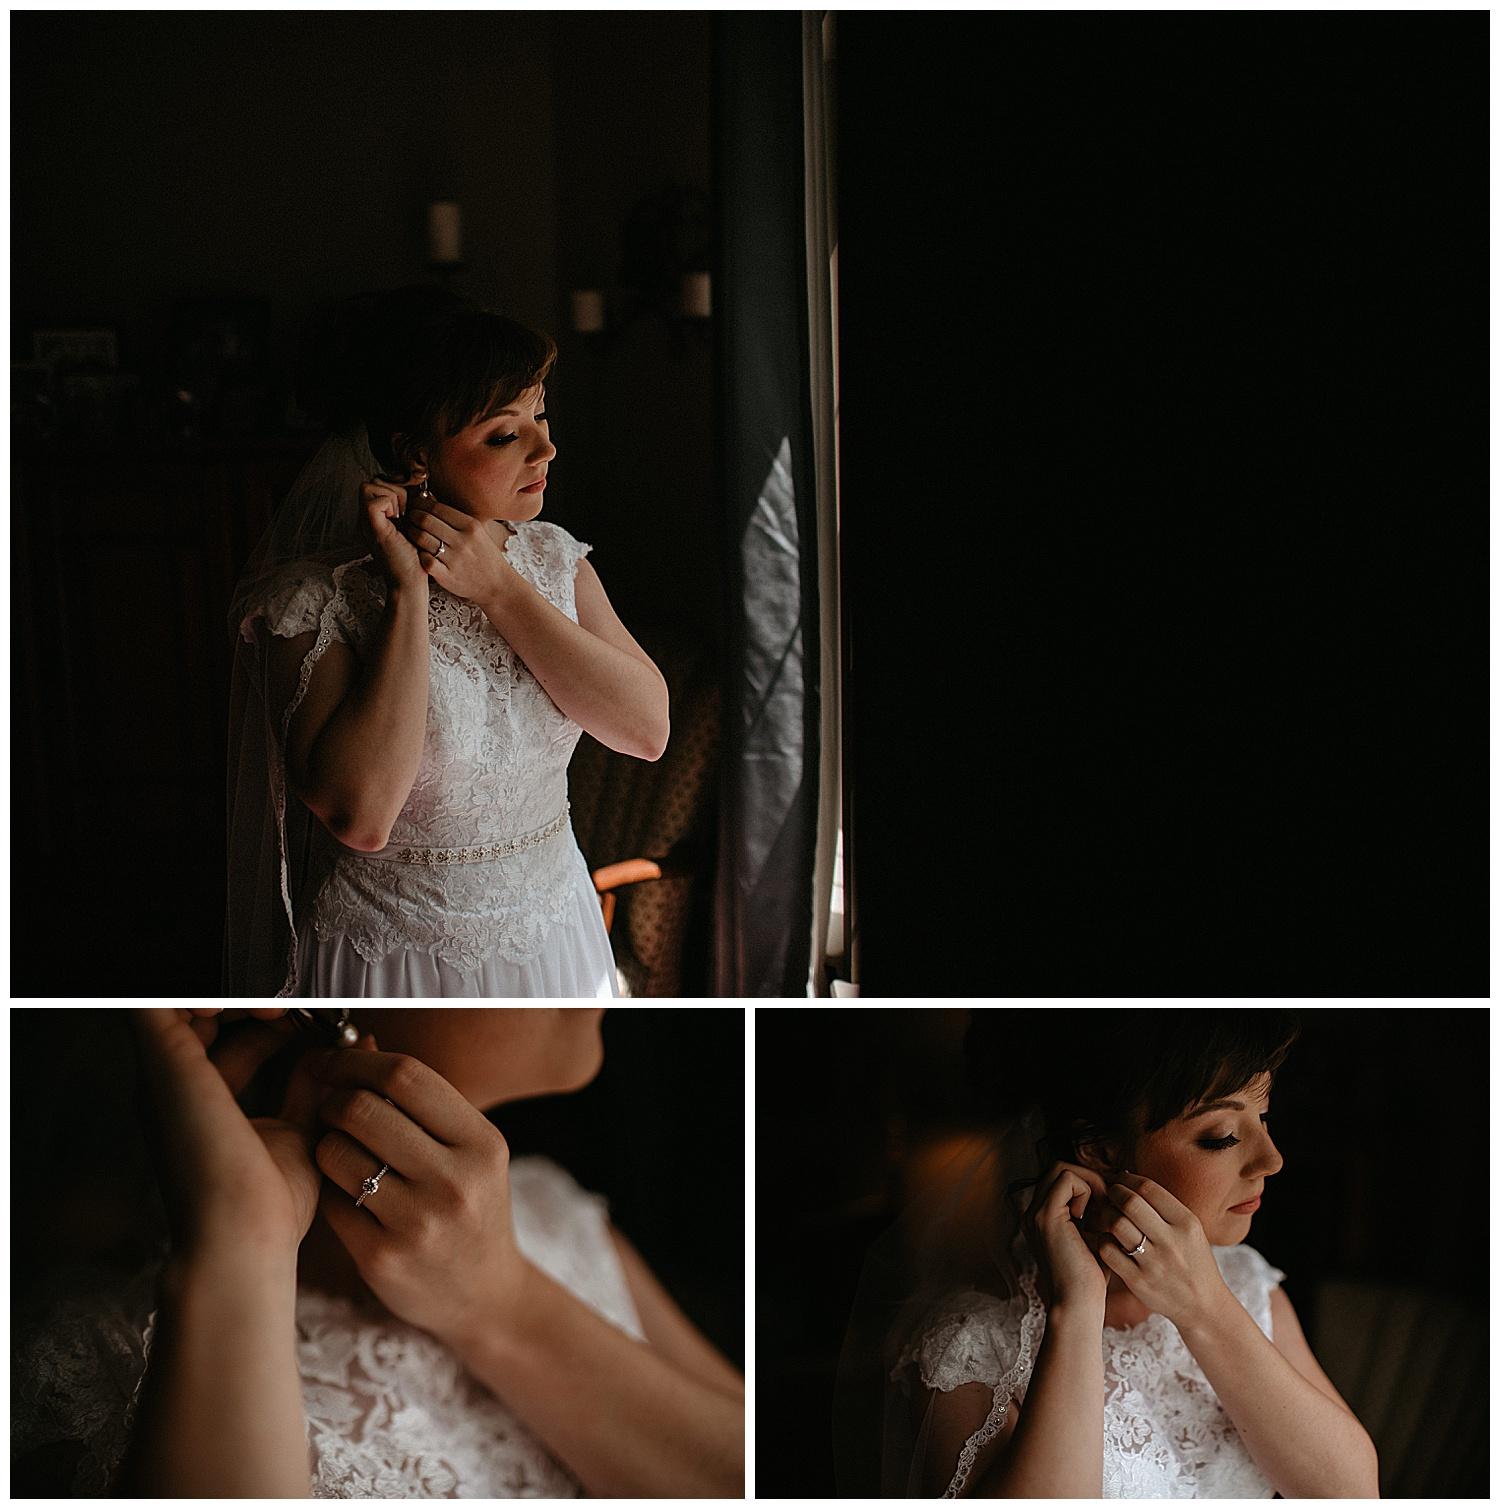 NEPA-Mount-Pocono-Wedding-Photographer-at-the-Stroudsmoor-Country-Inn-Stroudsburg-PA_0012.jpg